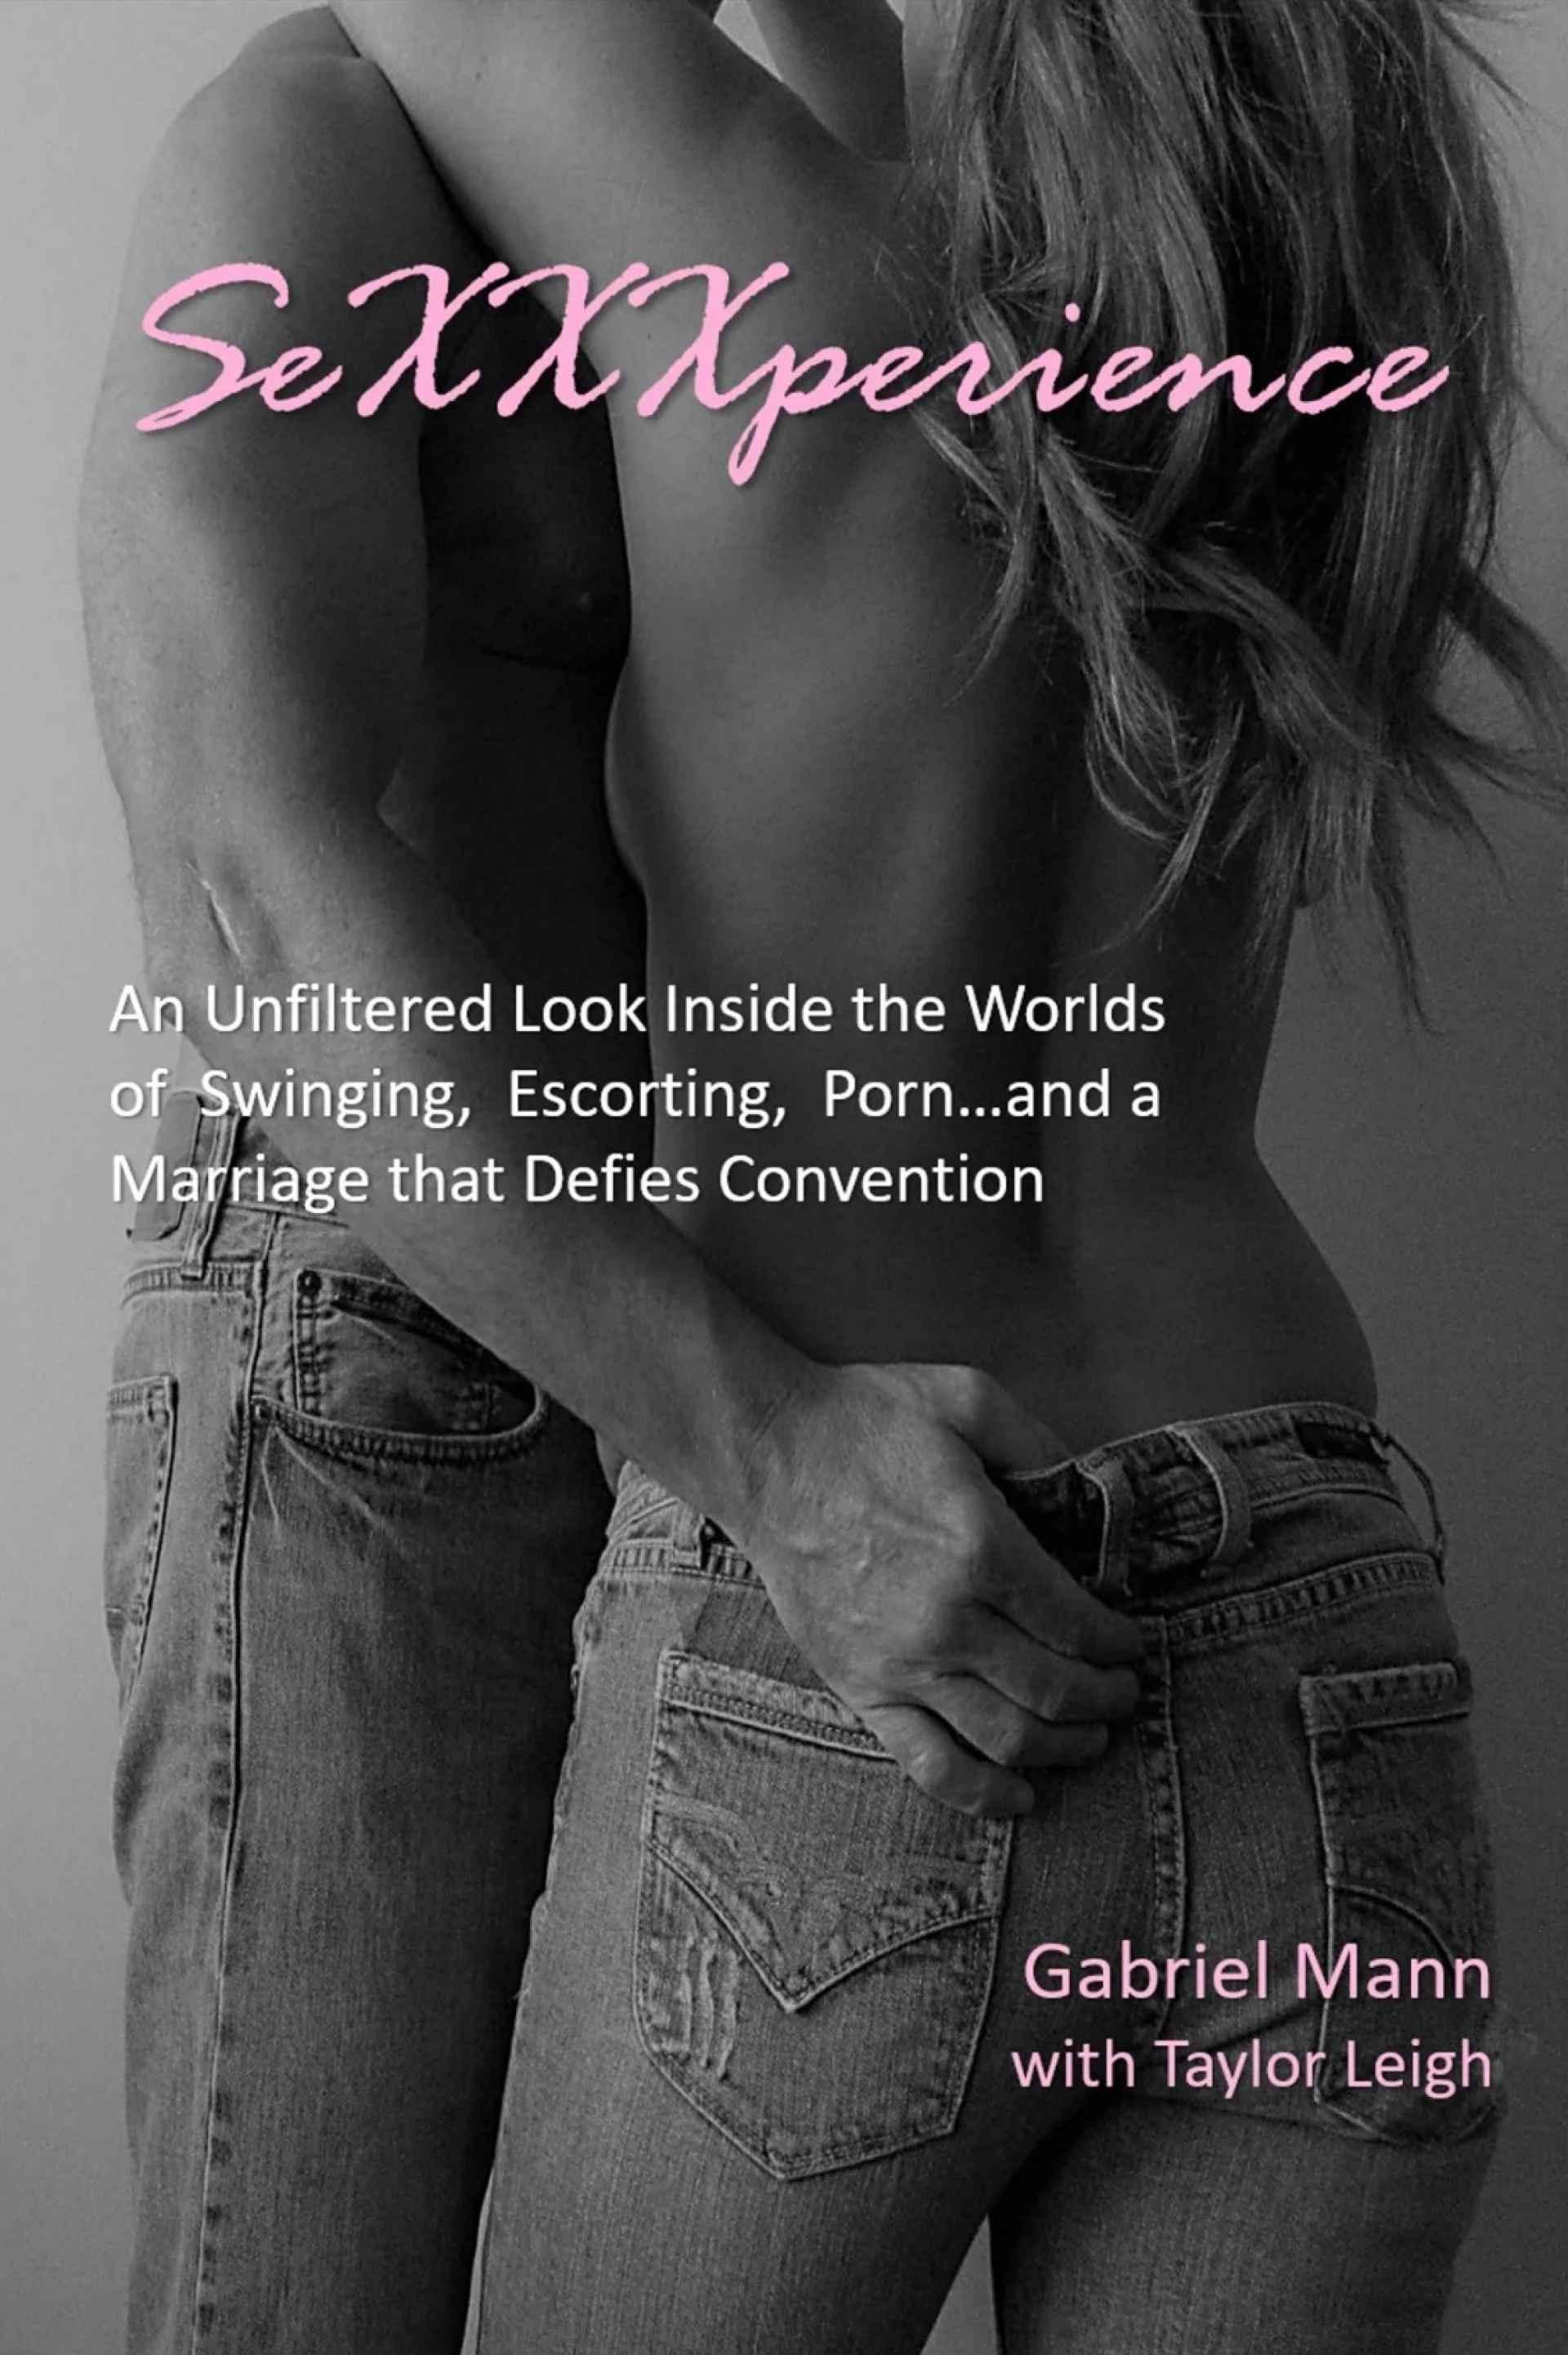 SDC SeXXXperience Book Gabriel Mann Hotwife Taylor Leigh Swingers Sex Work NonMonogamy